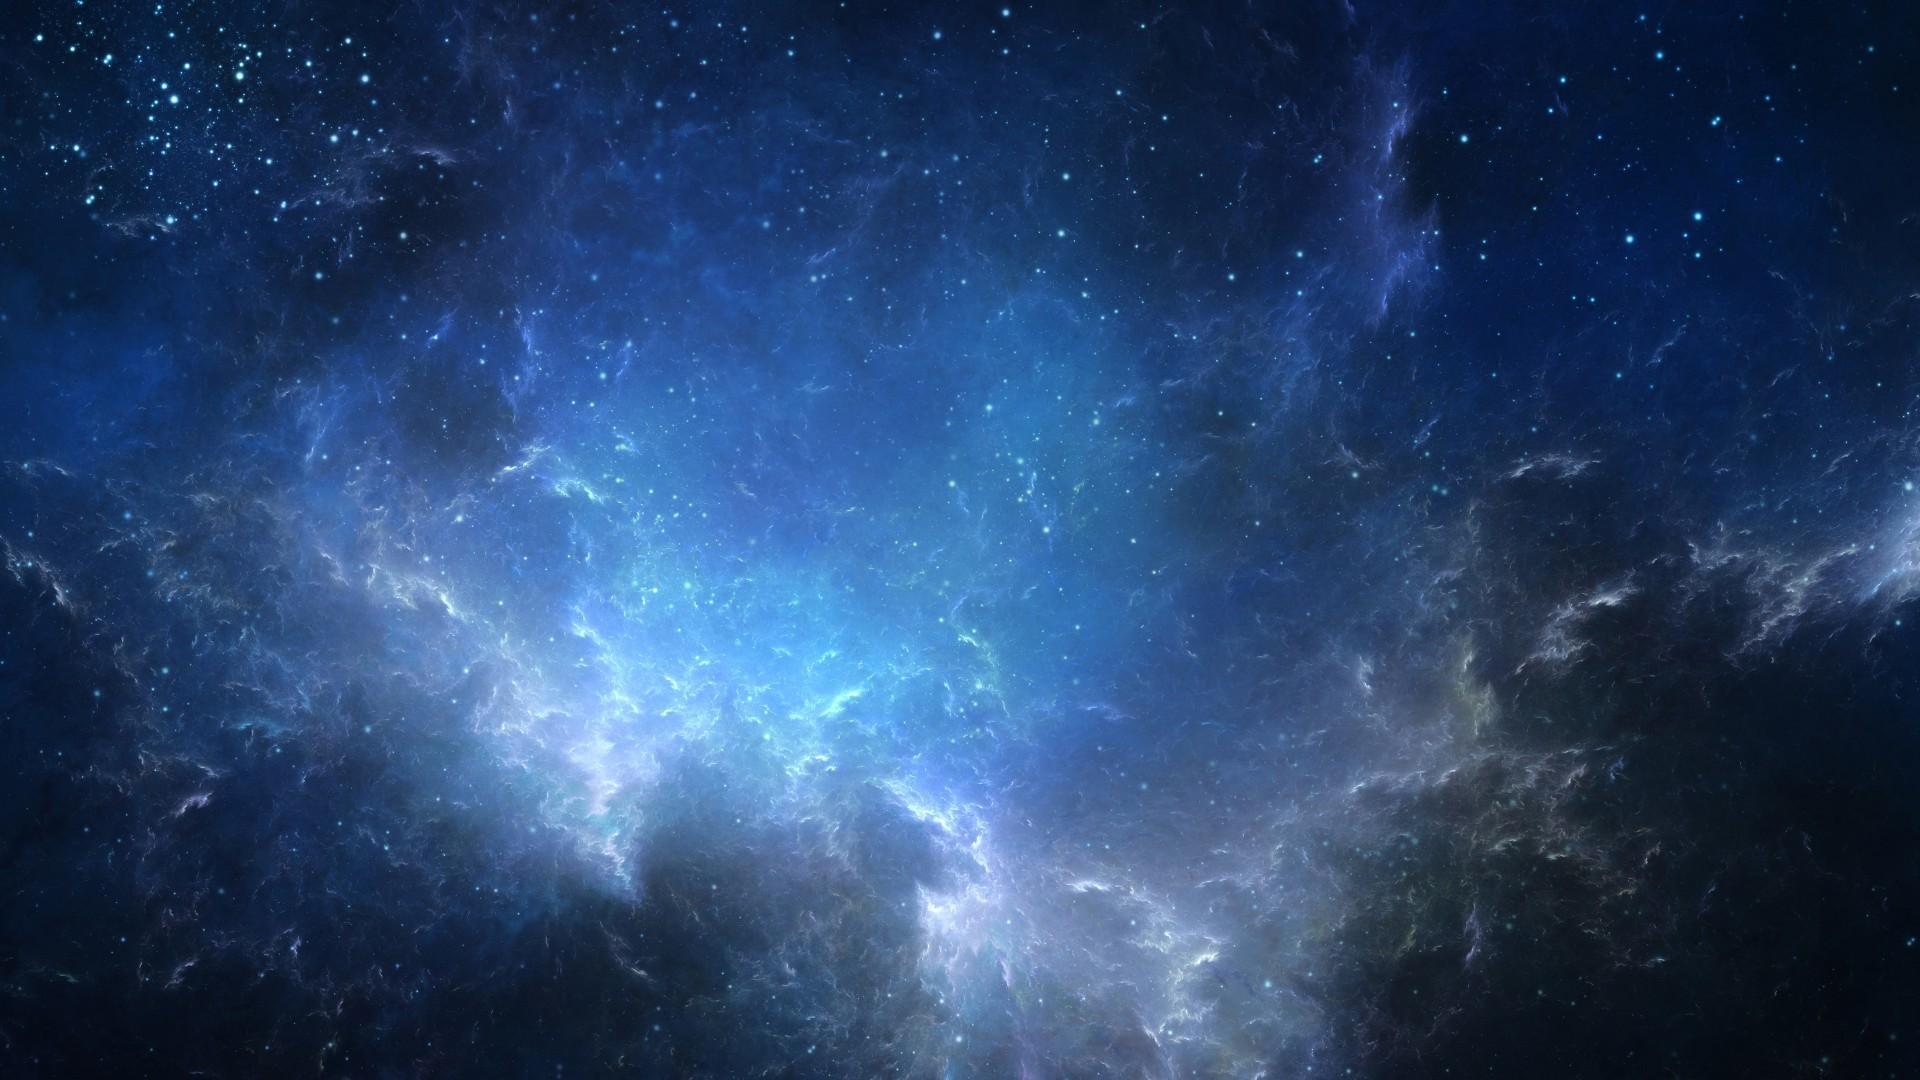 Space / Stars Wallpaper